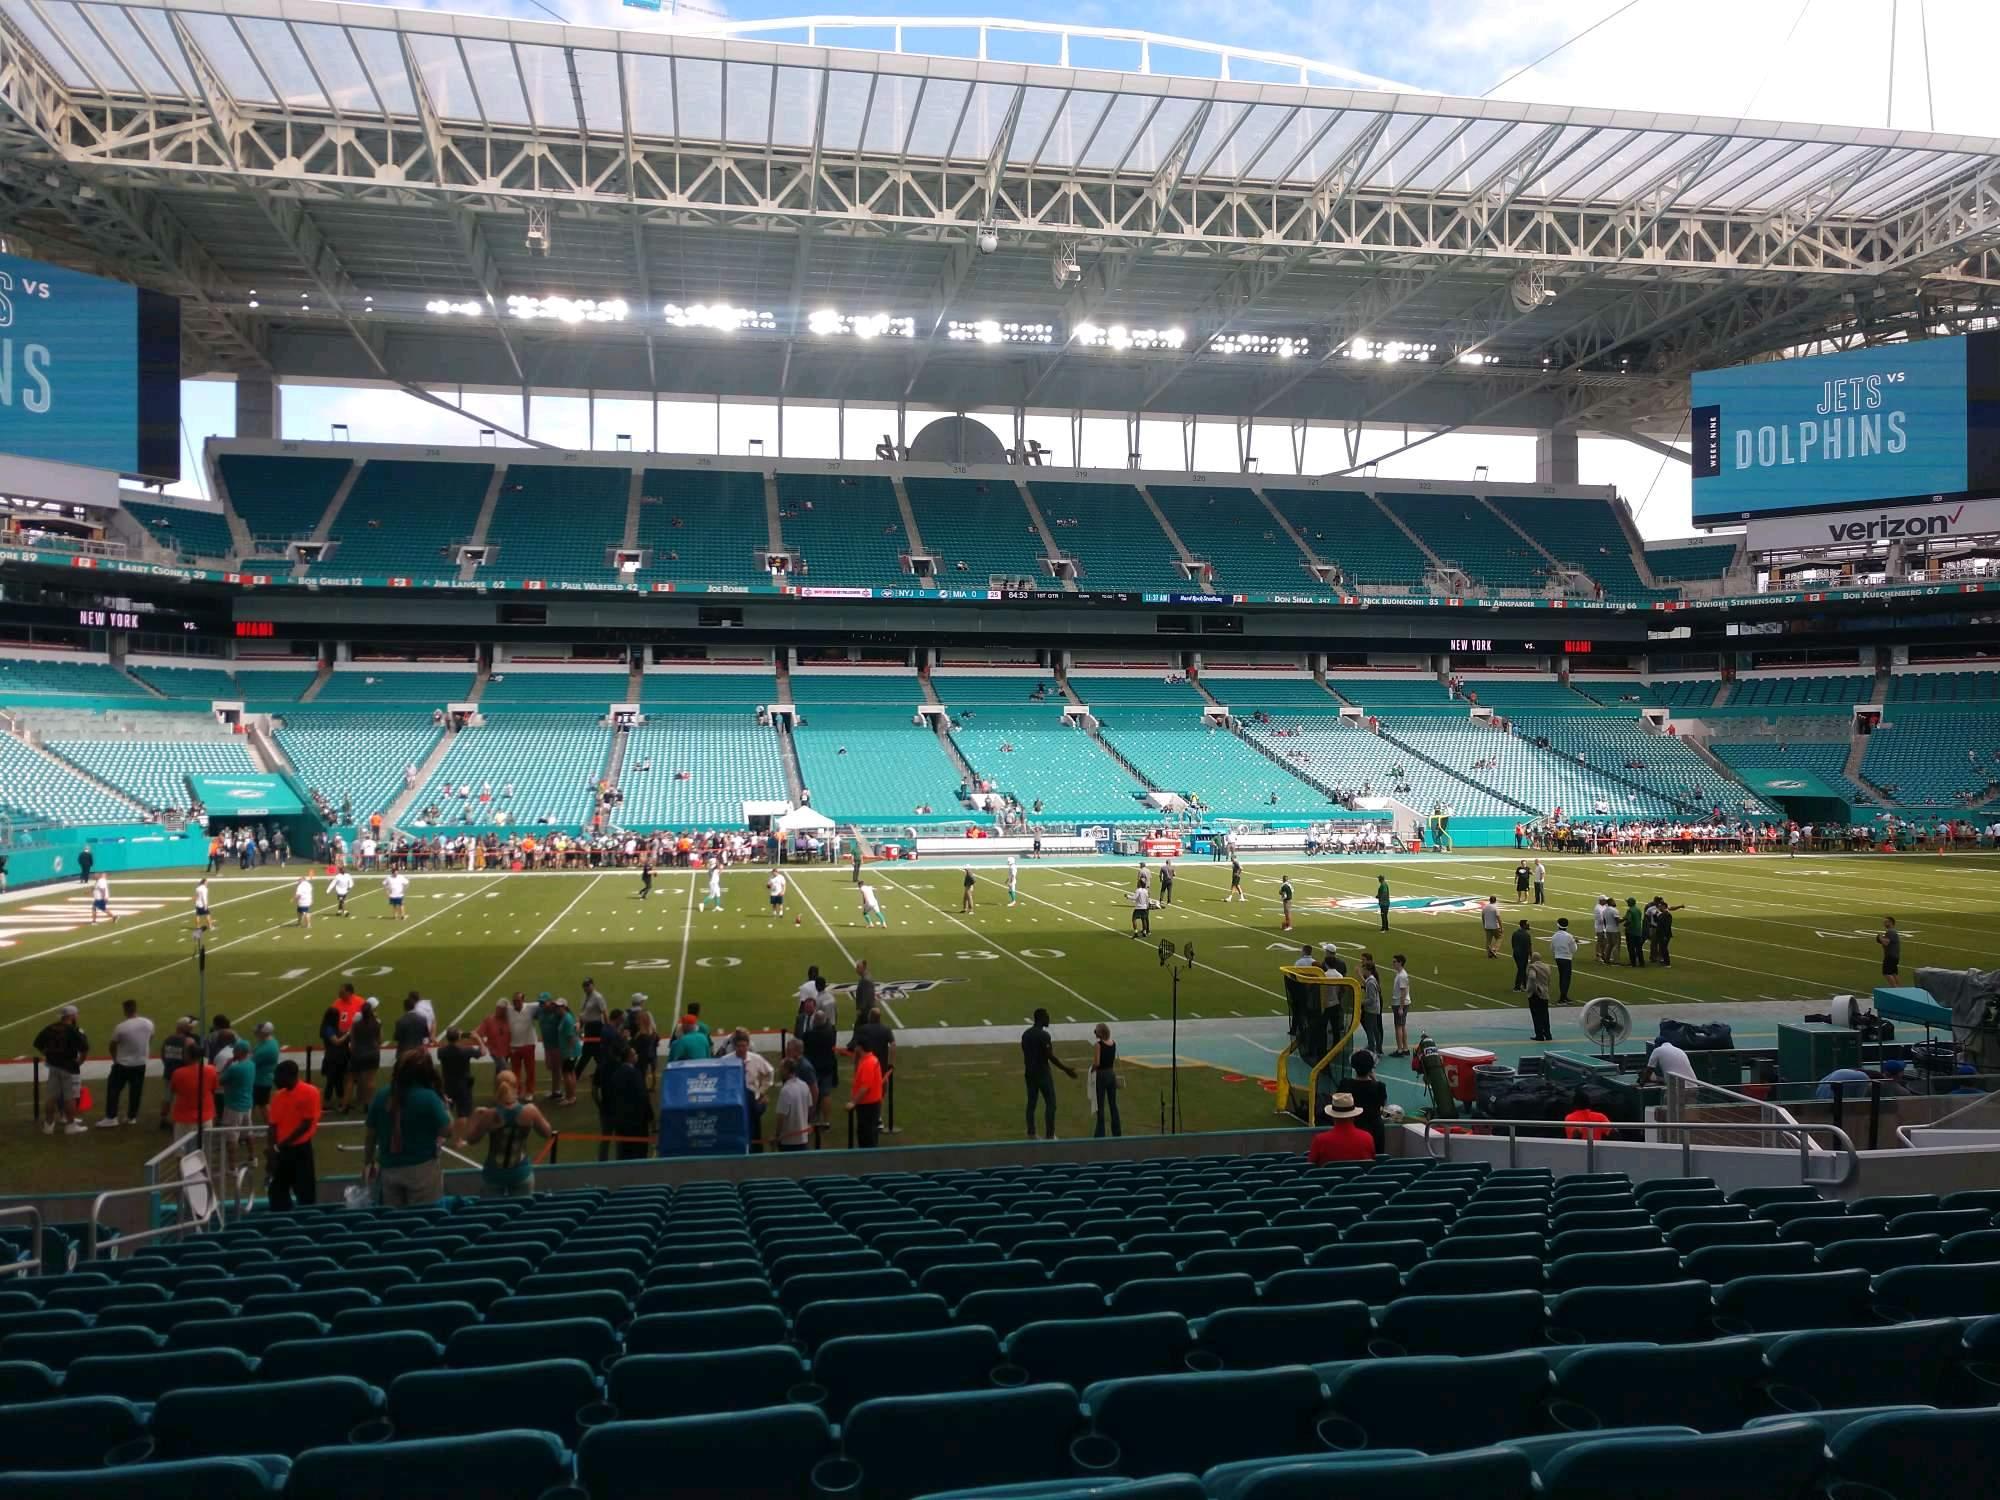 Hard Rock Stadium Section 148 Row 17 Seat 18